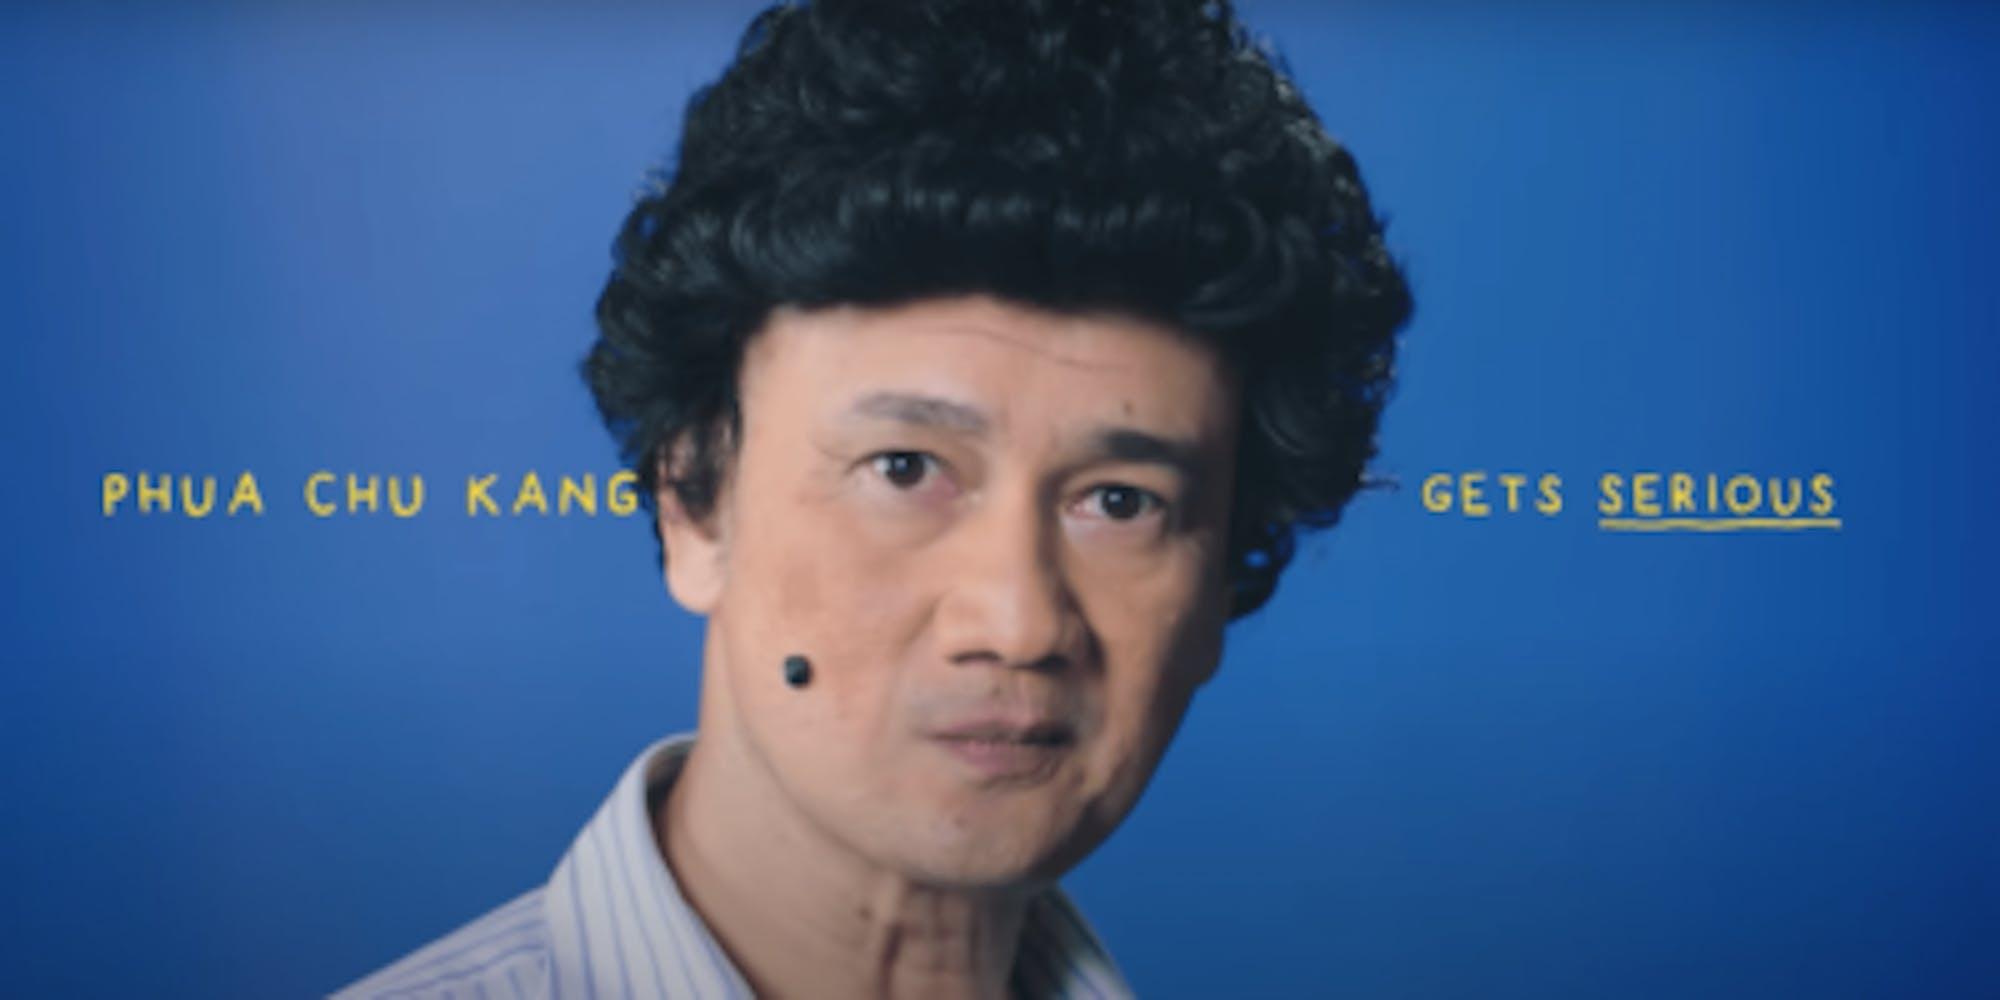 Phua Chu Kang's commercial thumbnail